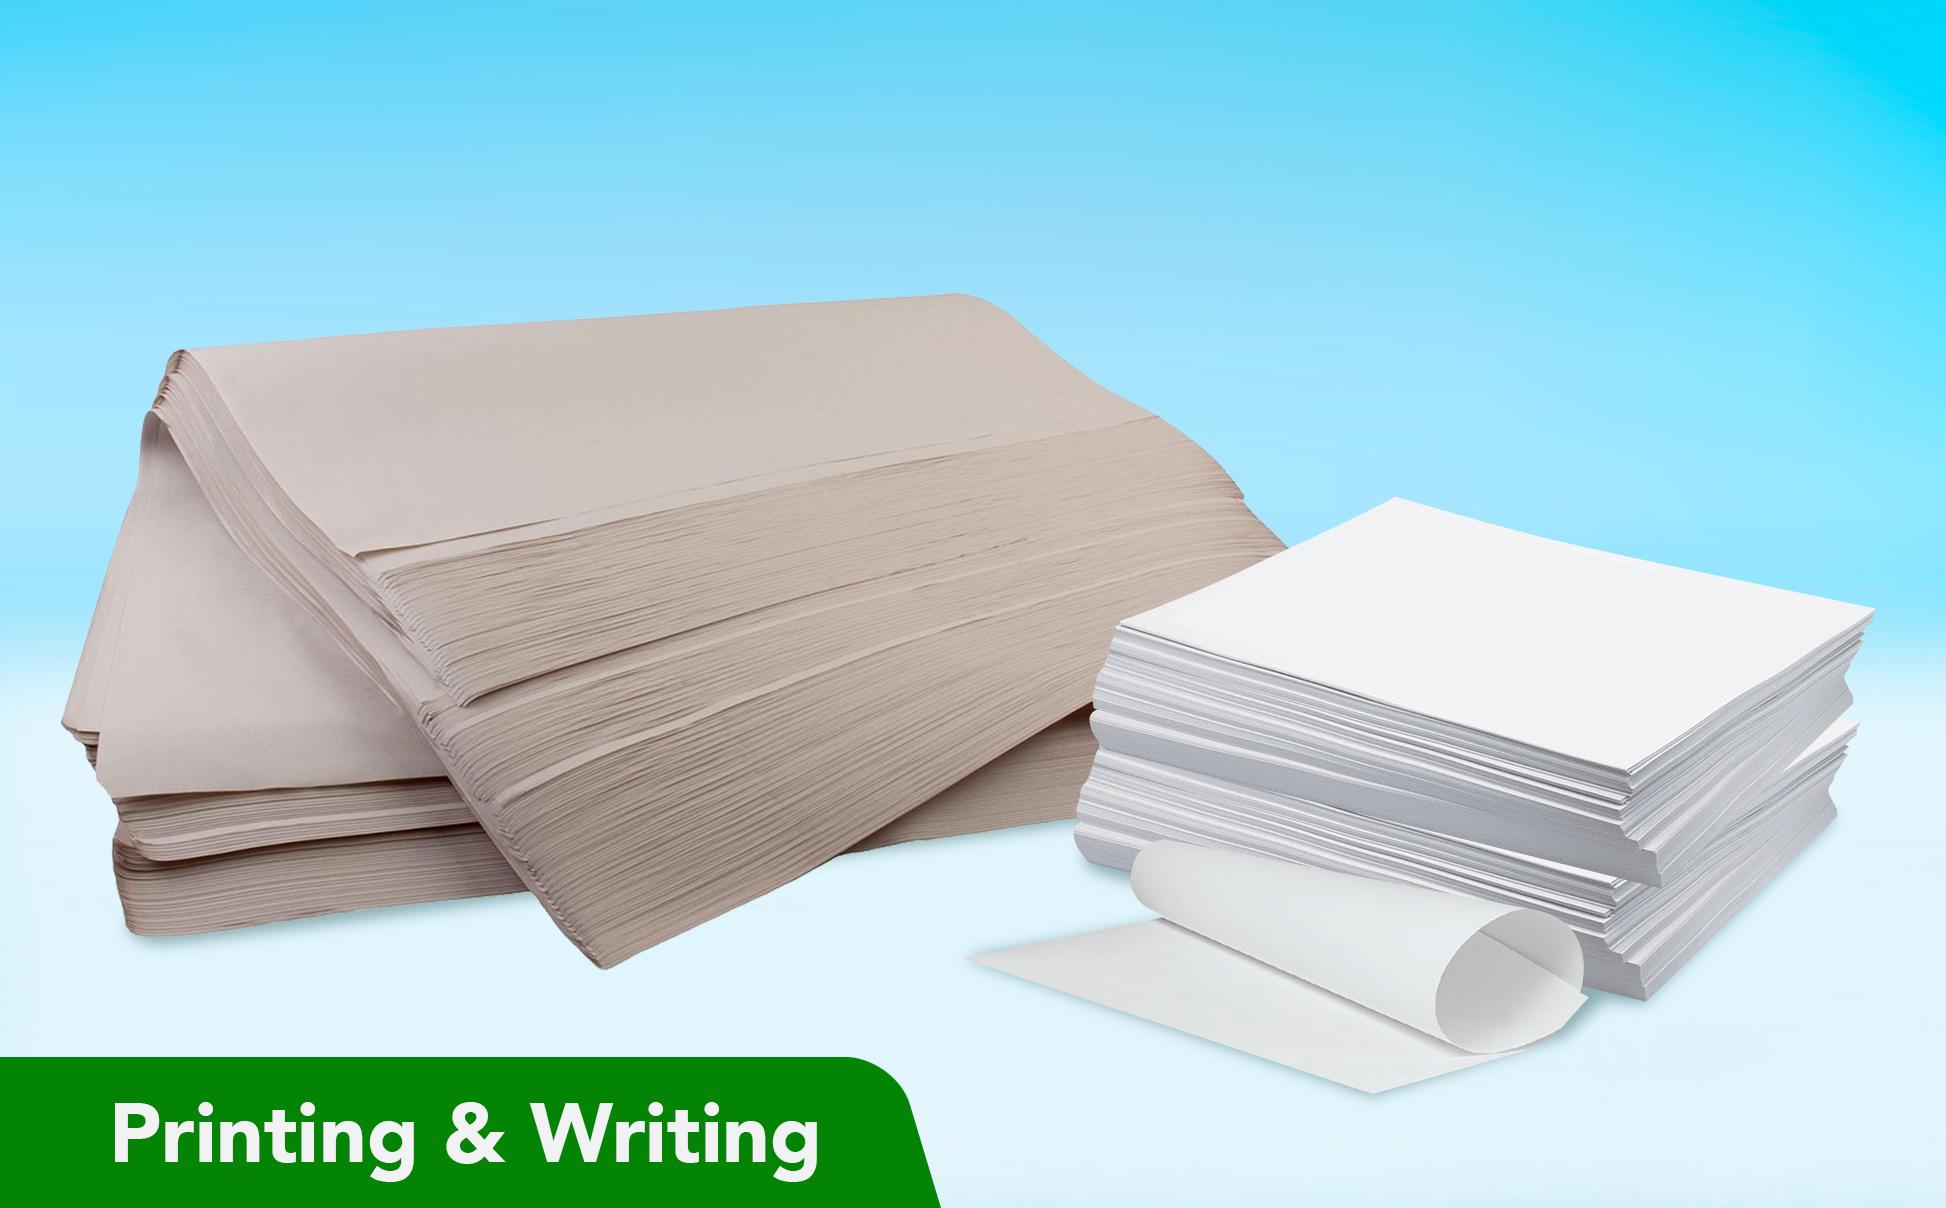 Printing & Writing